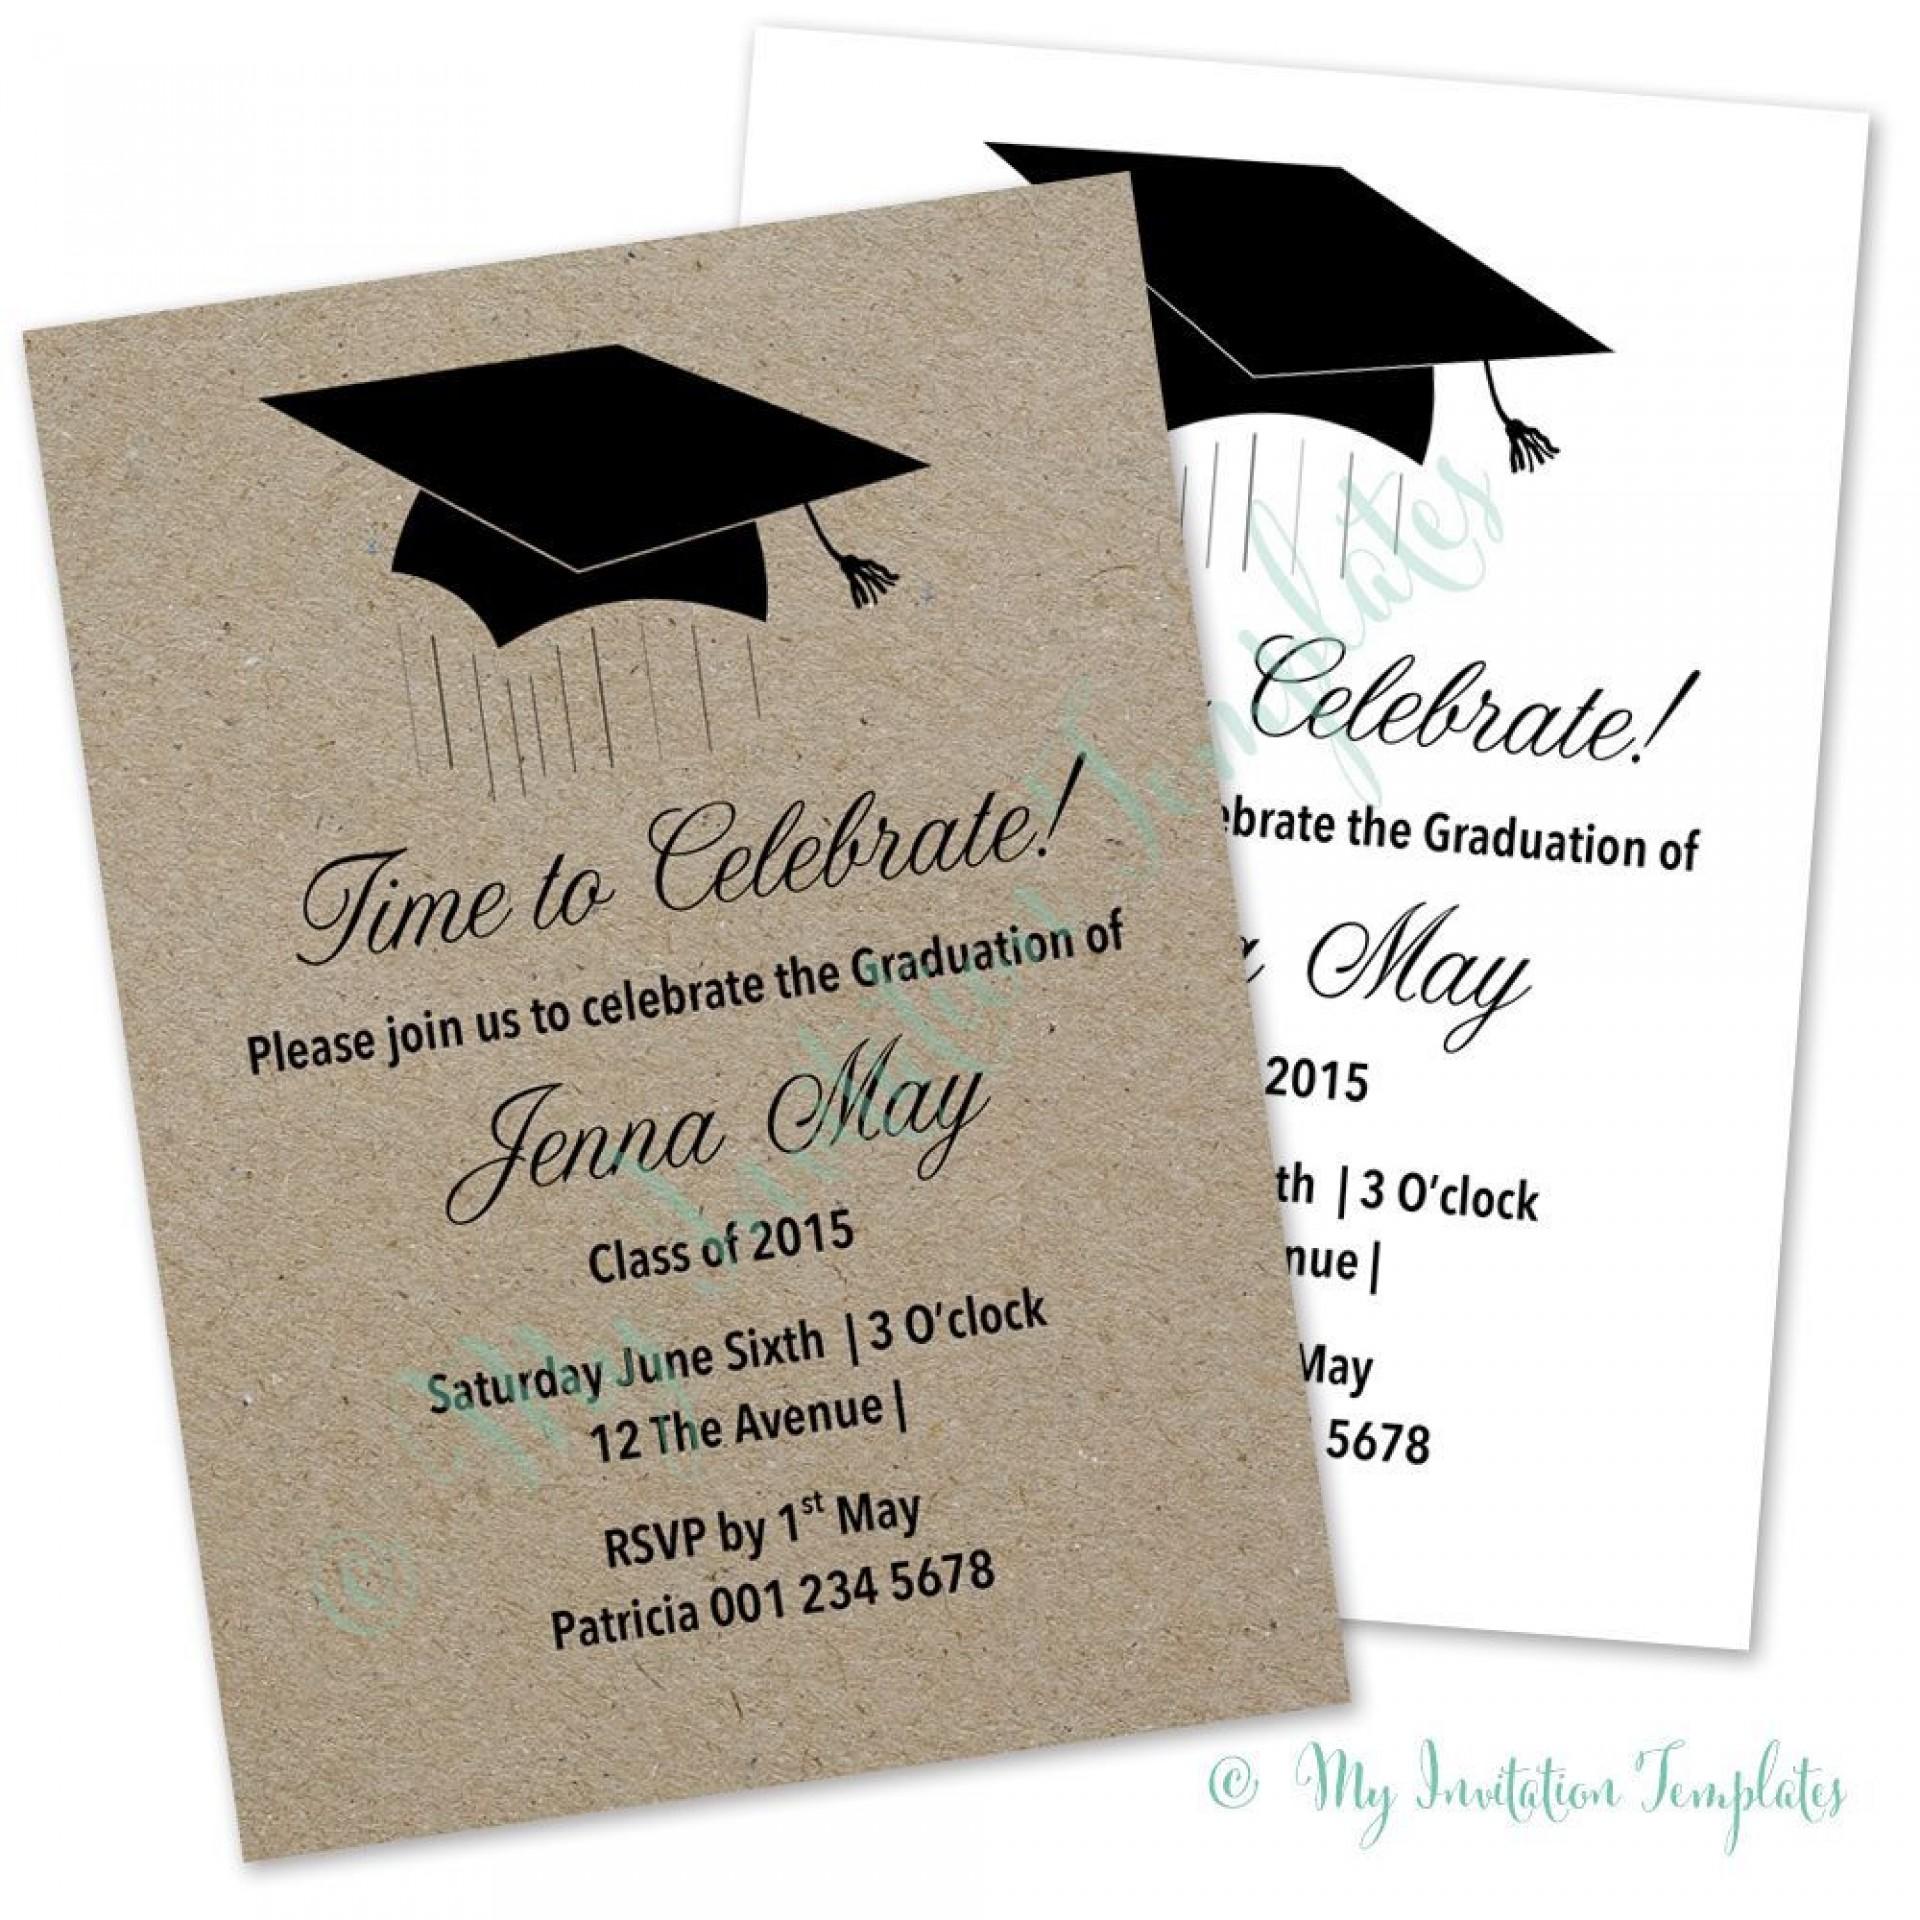 004 Breathtaking Microsoft Word Graduation Invitation Template Concept  Party1920